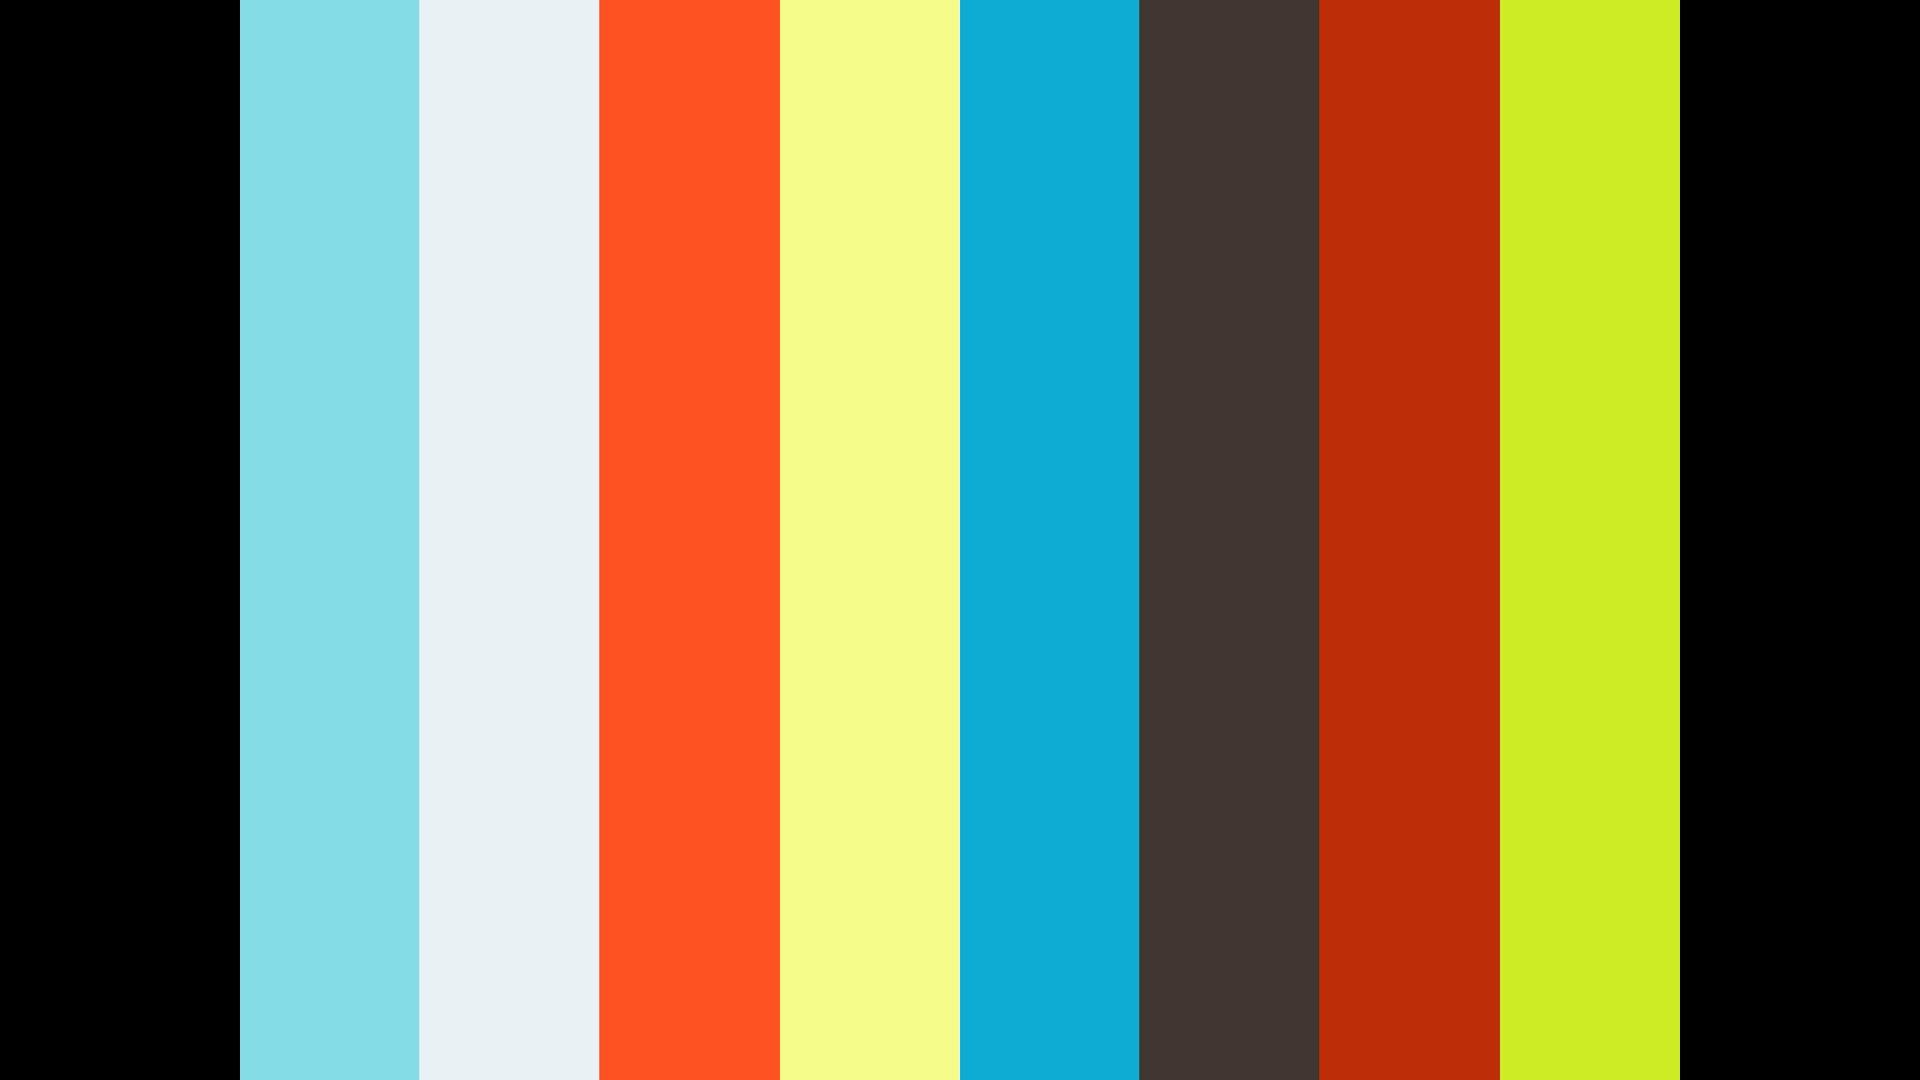 09_21_2020 - Brad - 1k WCOOP Part 2